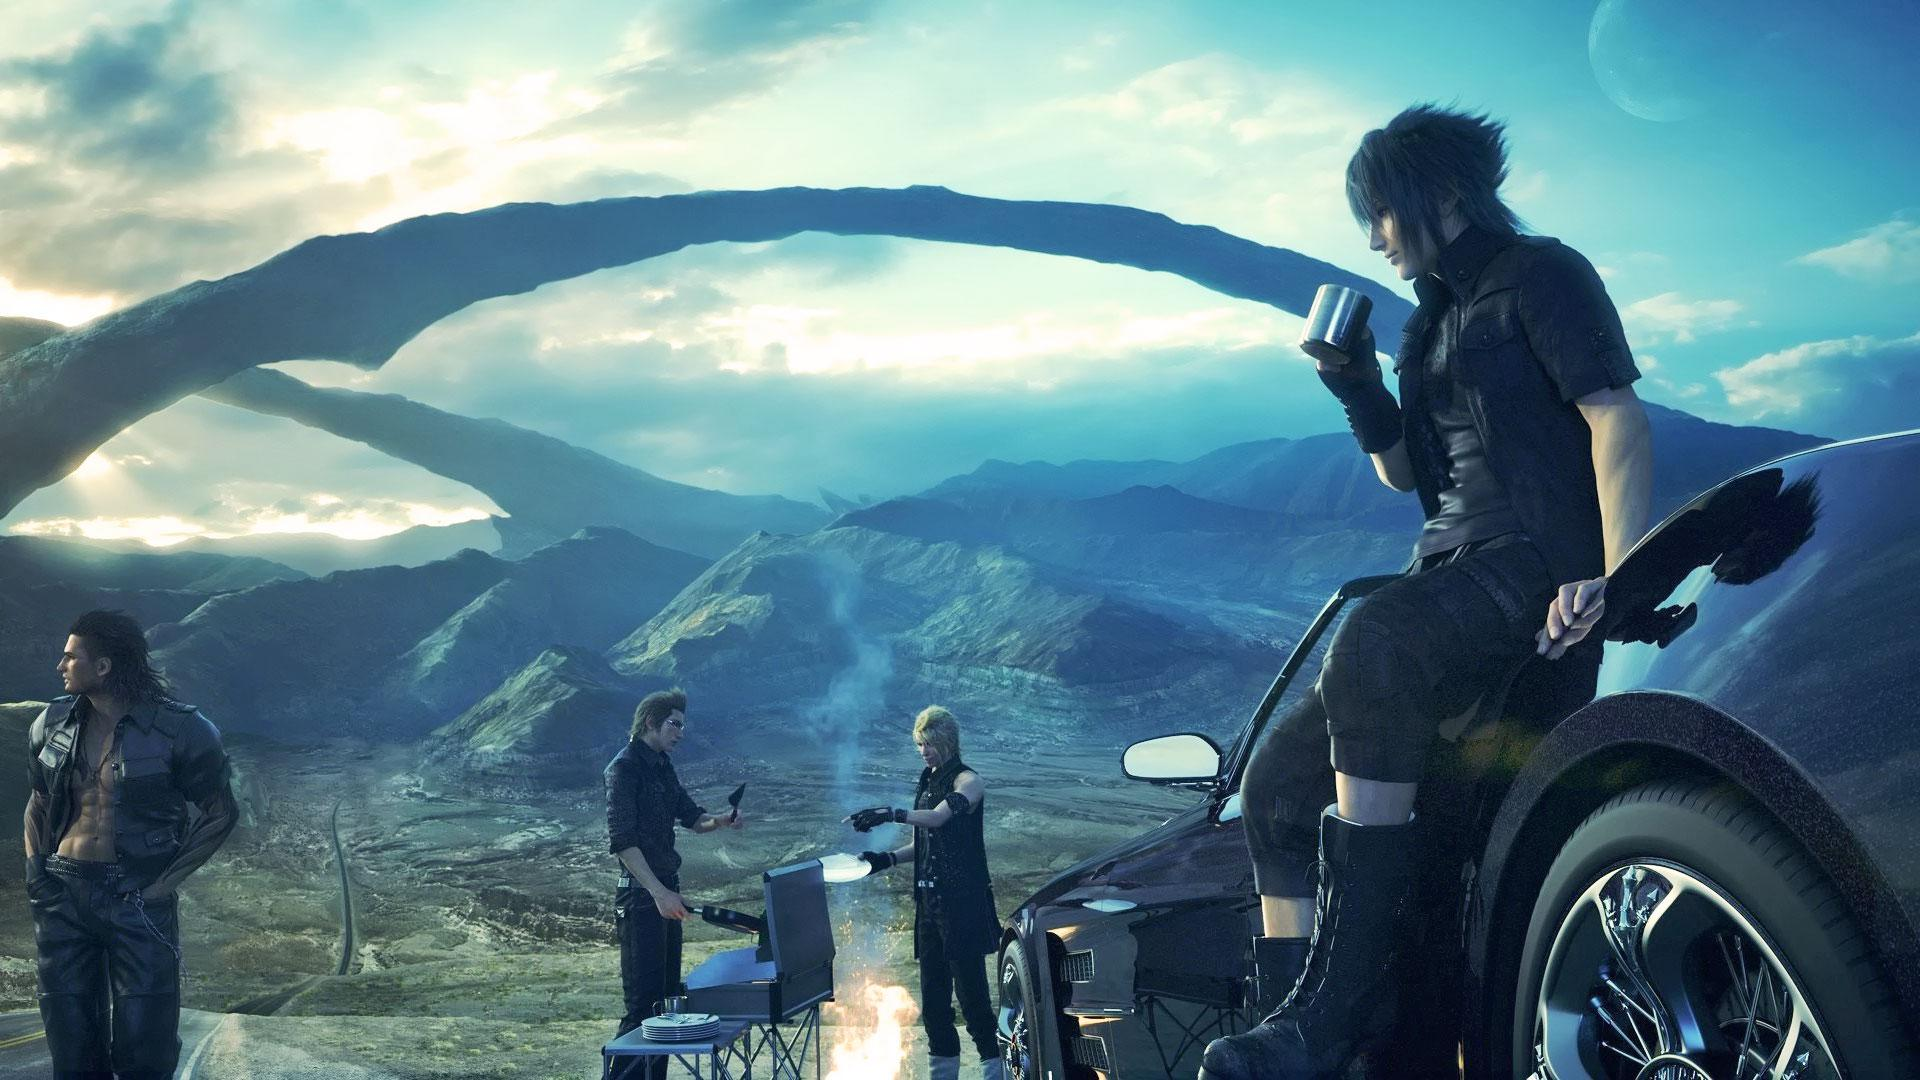 The Final Fantasy Xv Season Pass Includes Six Dlc Packs Engadget